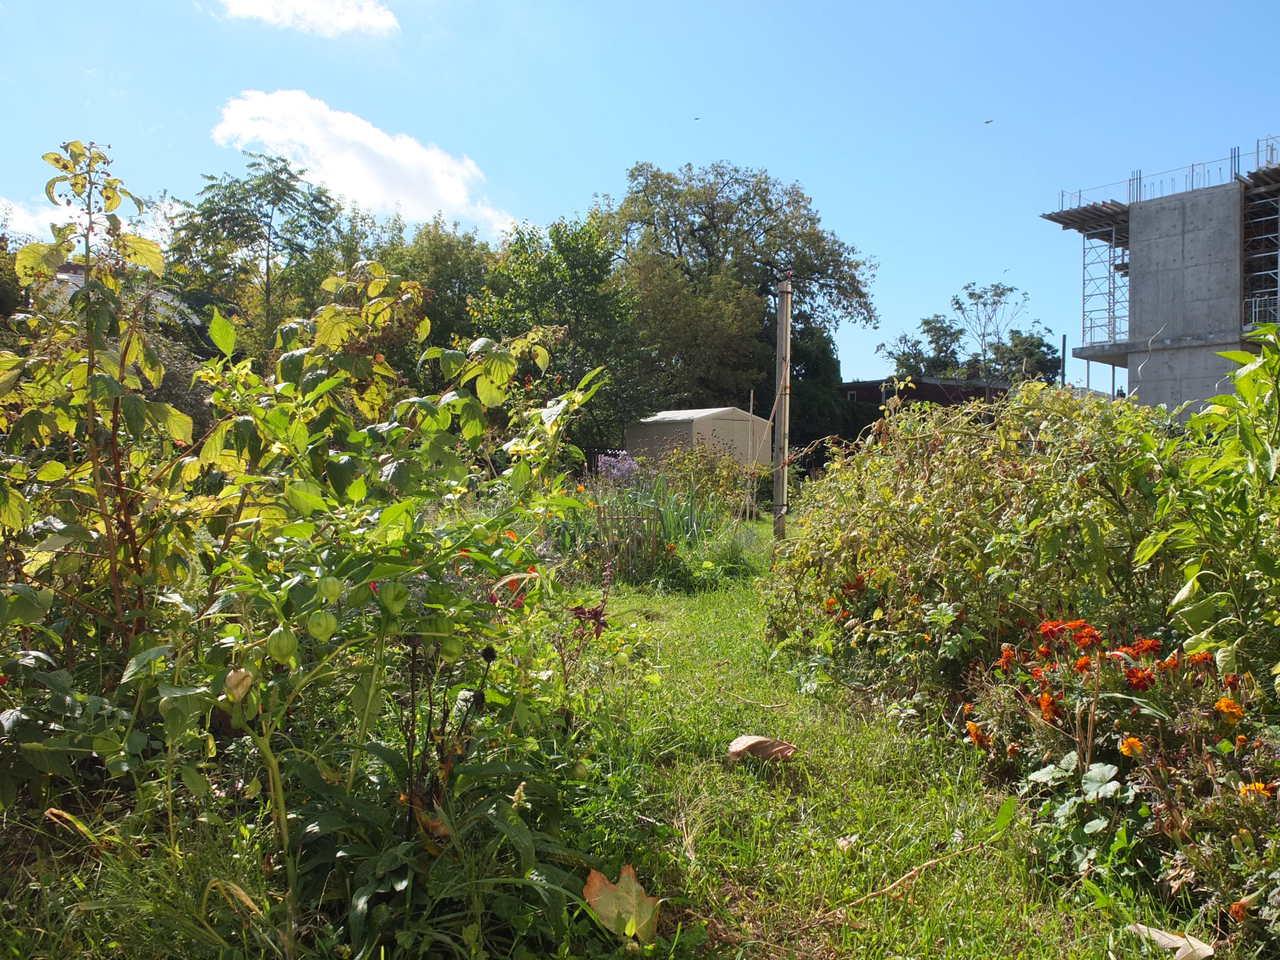 Garden behind Lillian H. Smith Branch